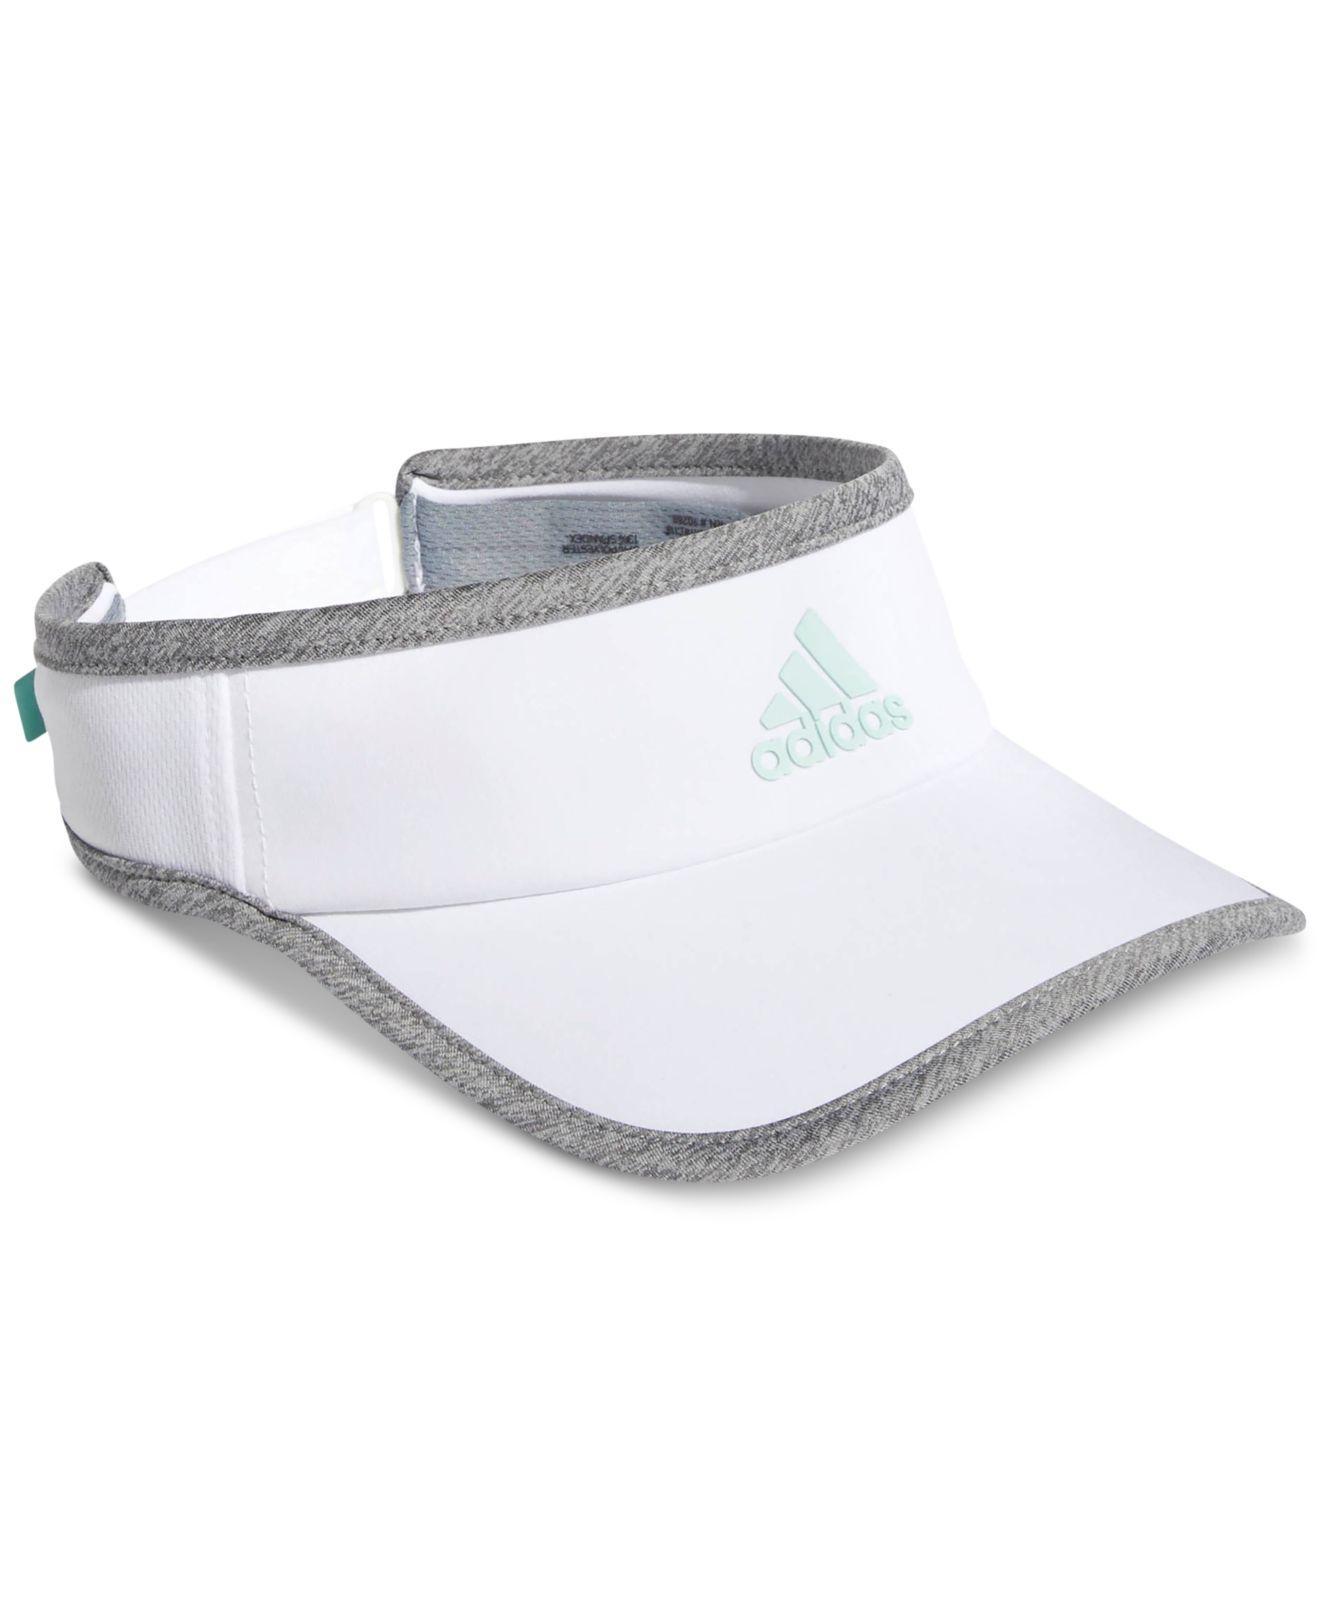 0db5f7a2fda Lyst - adidas Superlite Visor in White